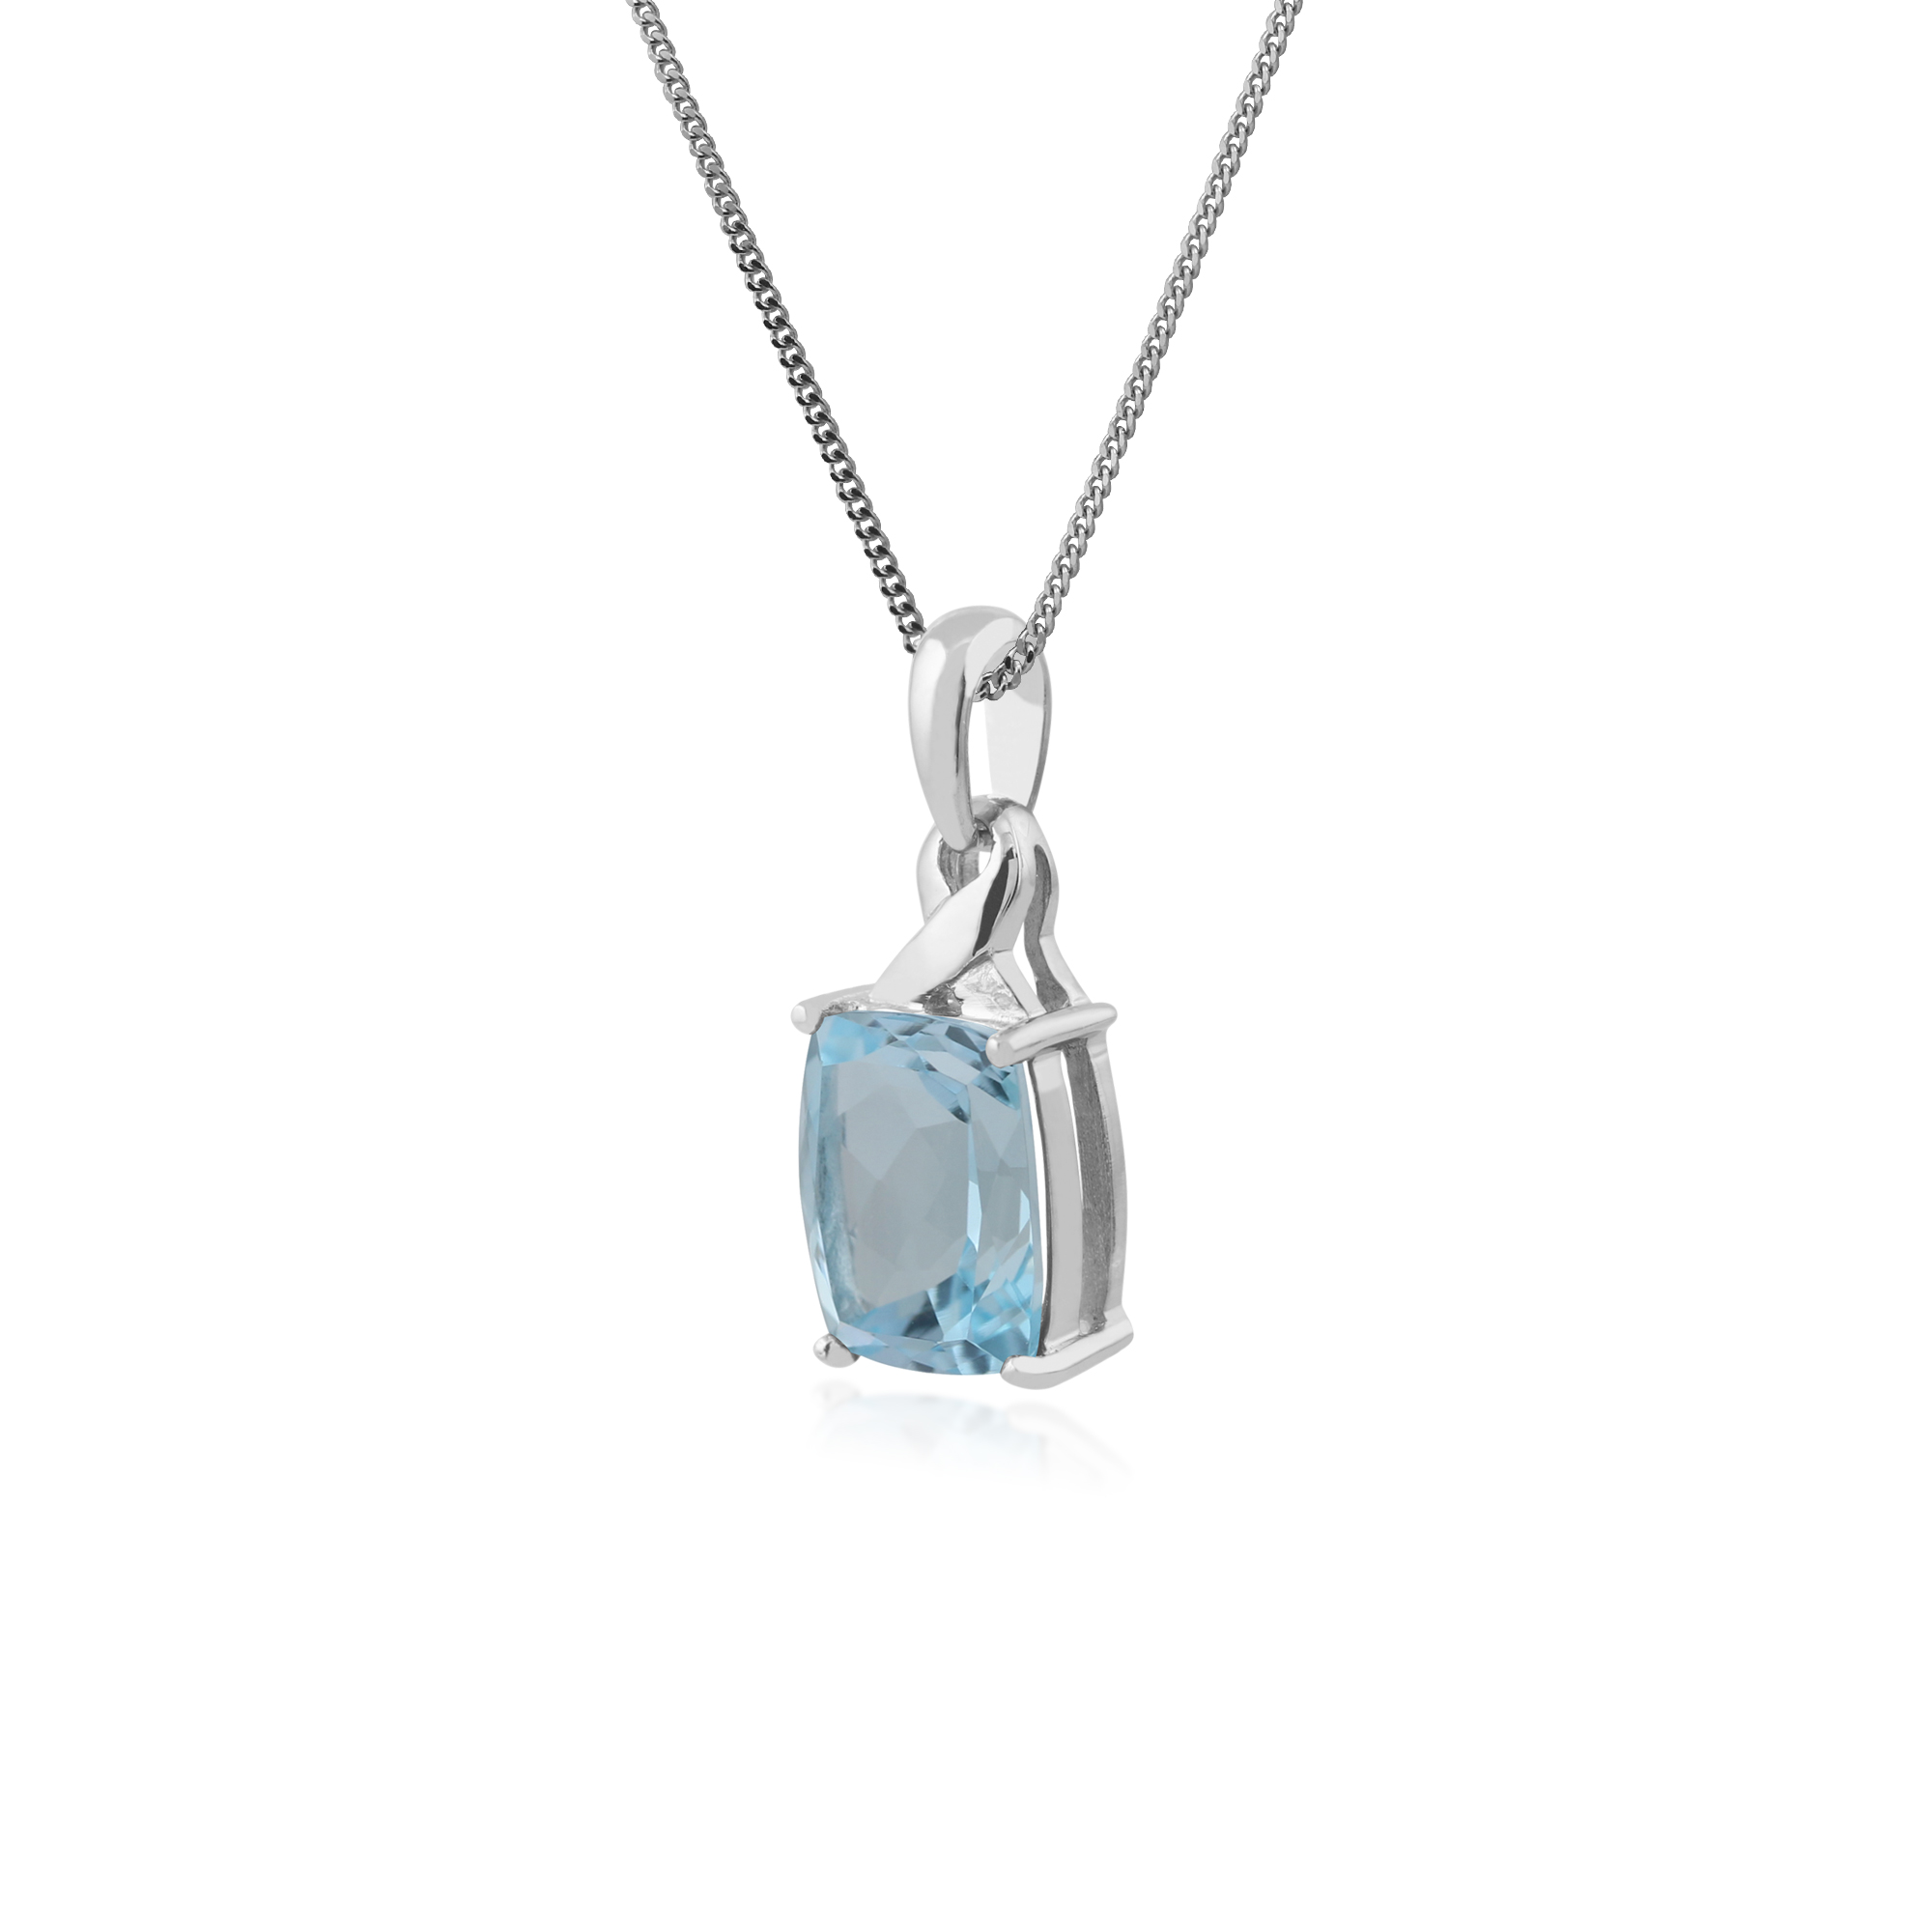 gemondo 9ct white gold 3 77ct blue topaz pendant on 45cm